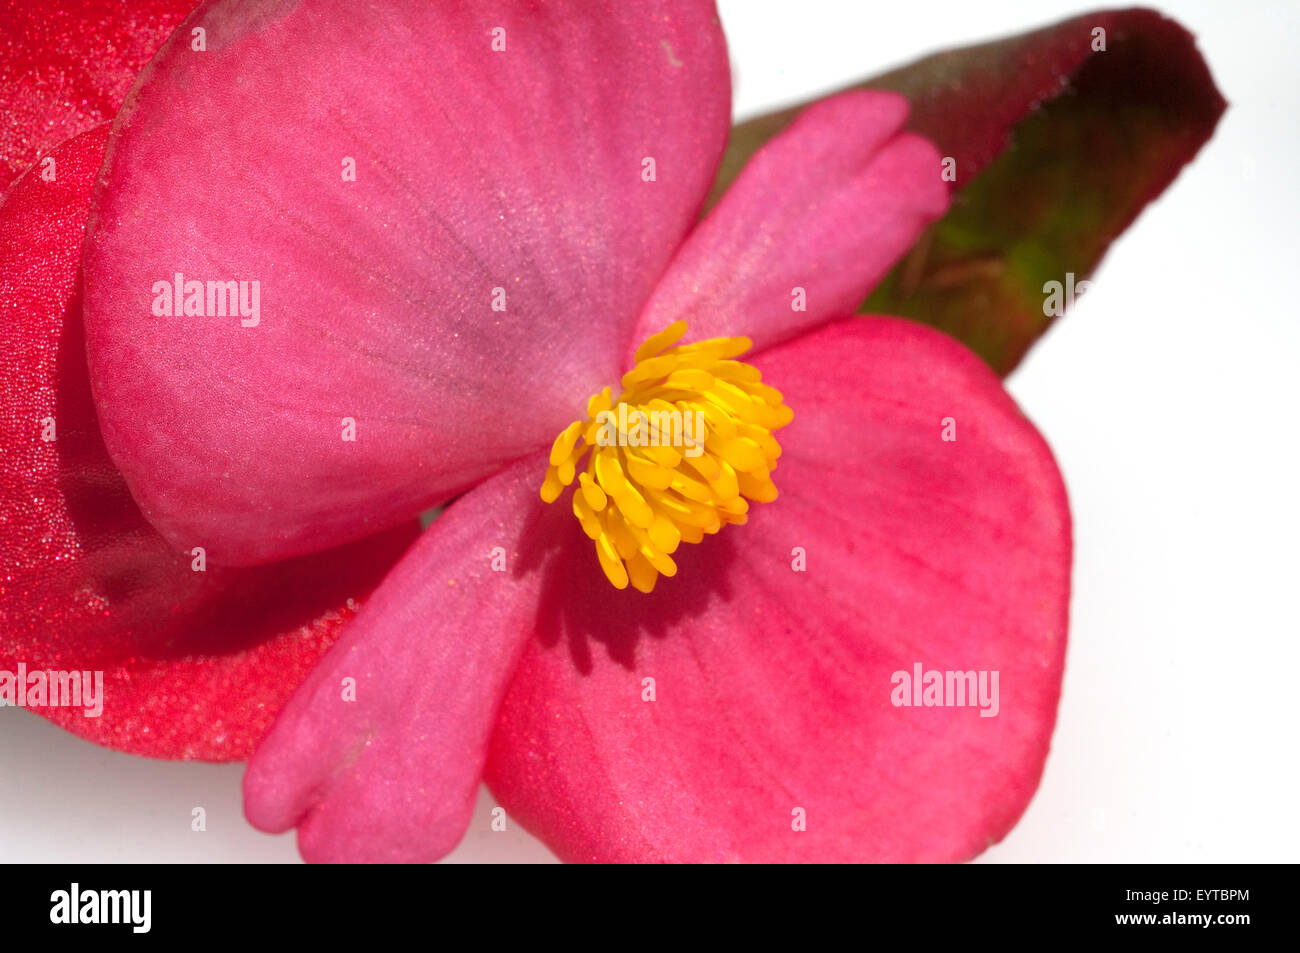 Begonie, Begonia, semperflorens, Balkonblumen, Stock Photo